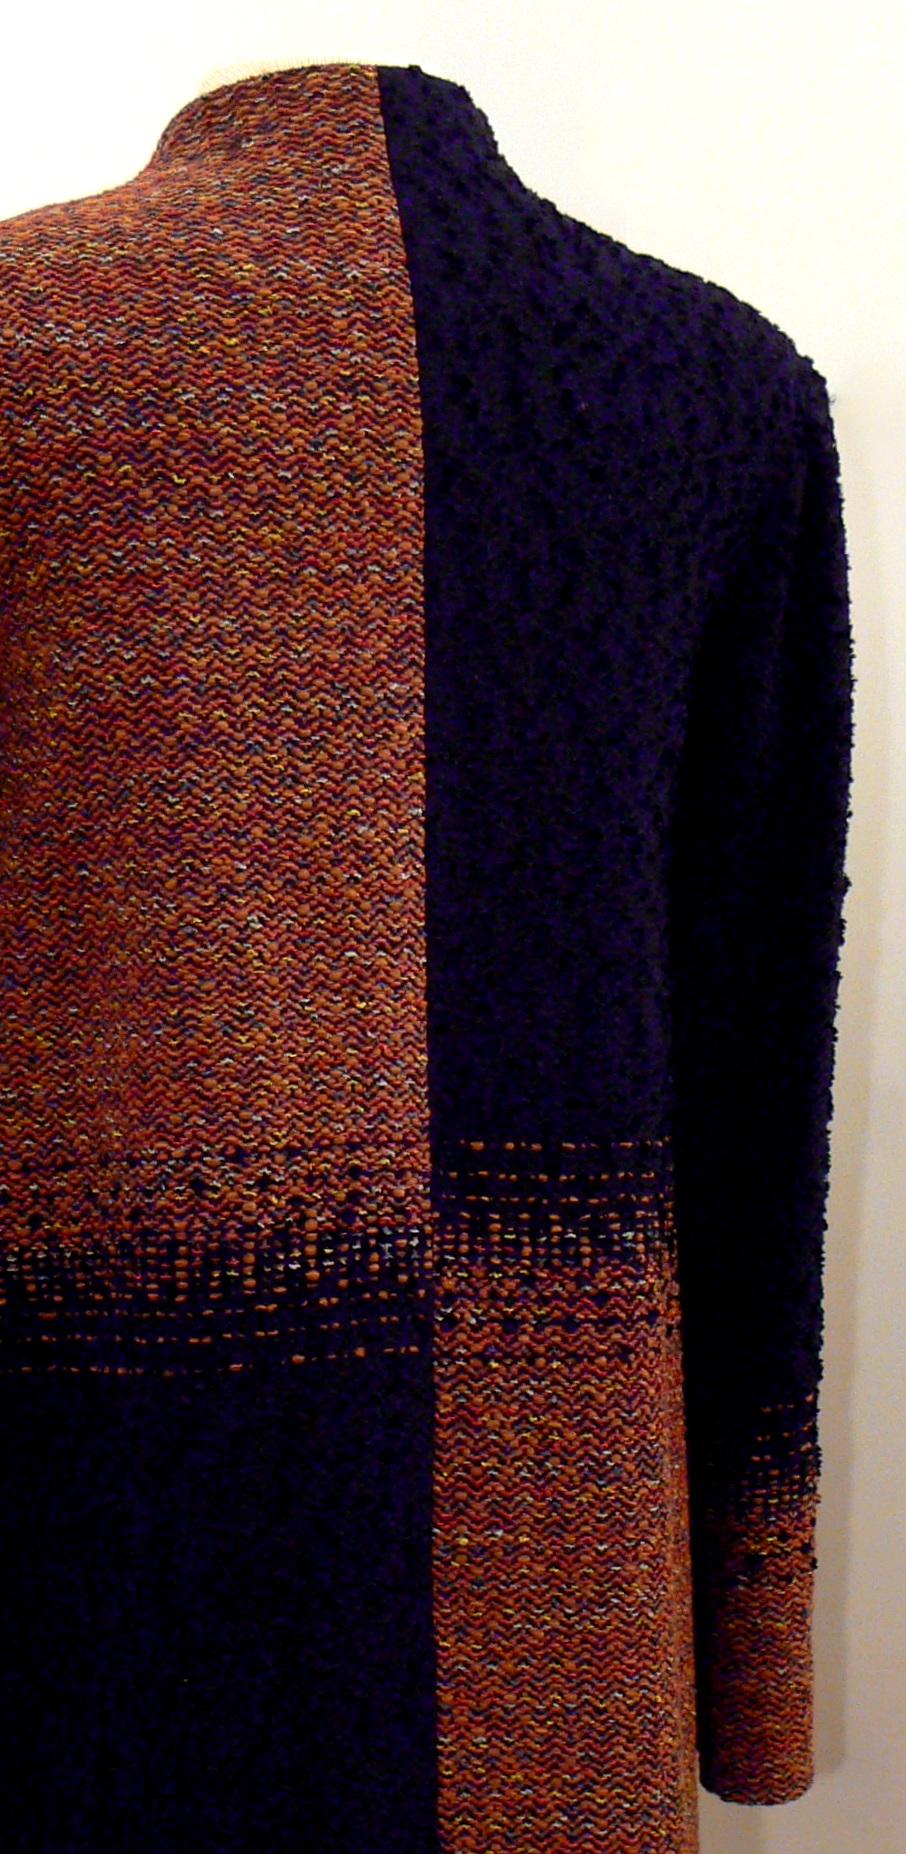 Handwoven Clothing, Coats, Kathleen Weir-West, 37-001.JPG